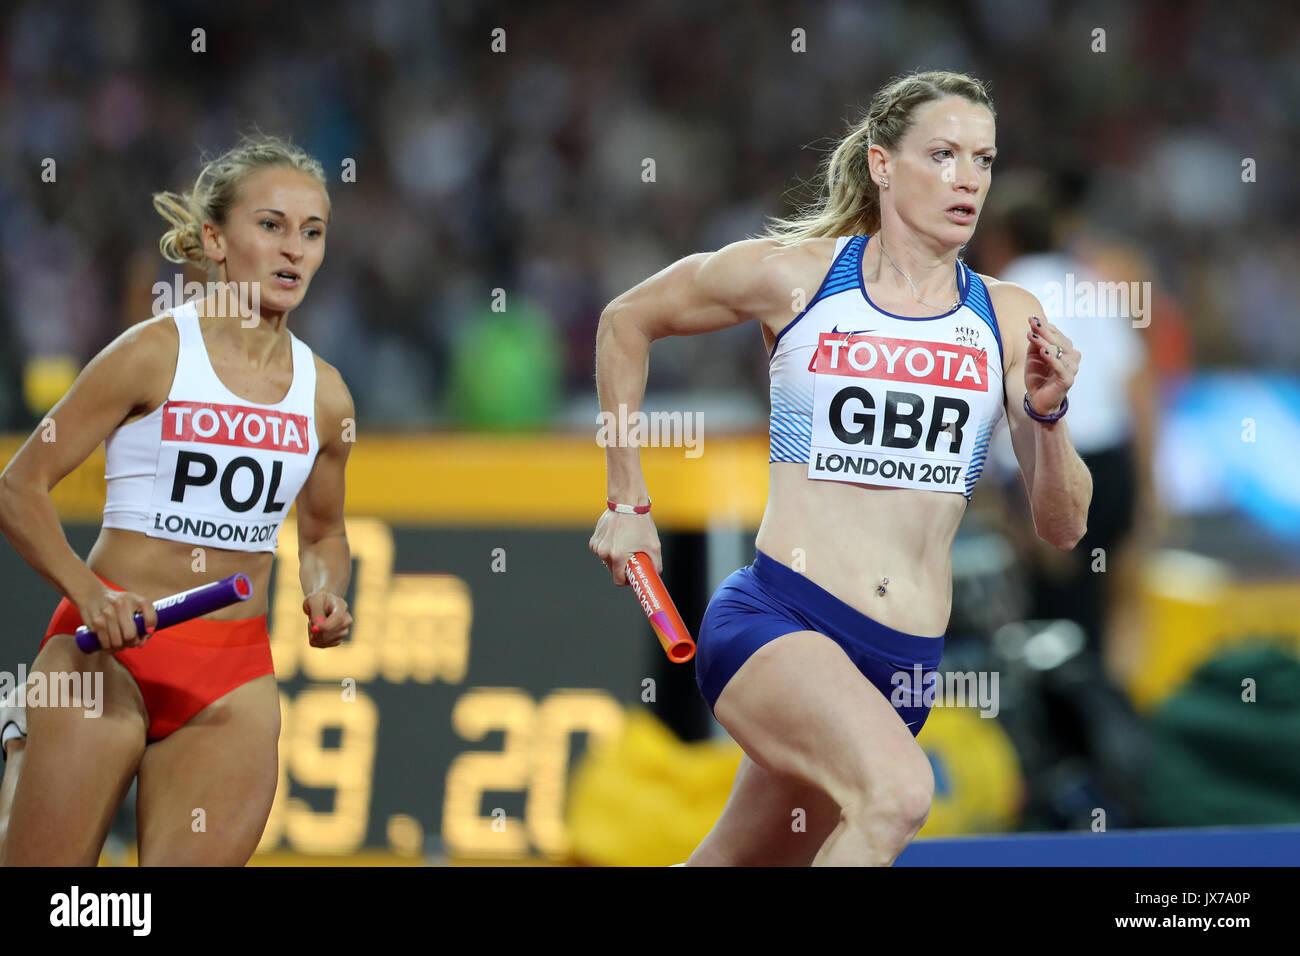 Eilidh DOYLE (Great Britain) & Aleksandra GAWORSKA (Poland) running the third leg in the Women's 4 x 400m Final at the 2017 IAAF World Championships, Queen Elizabeth Olympic Park, Stratford, London, UK. - Stock Image